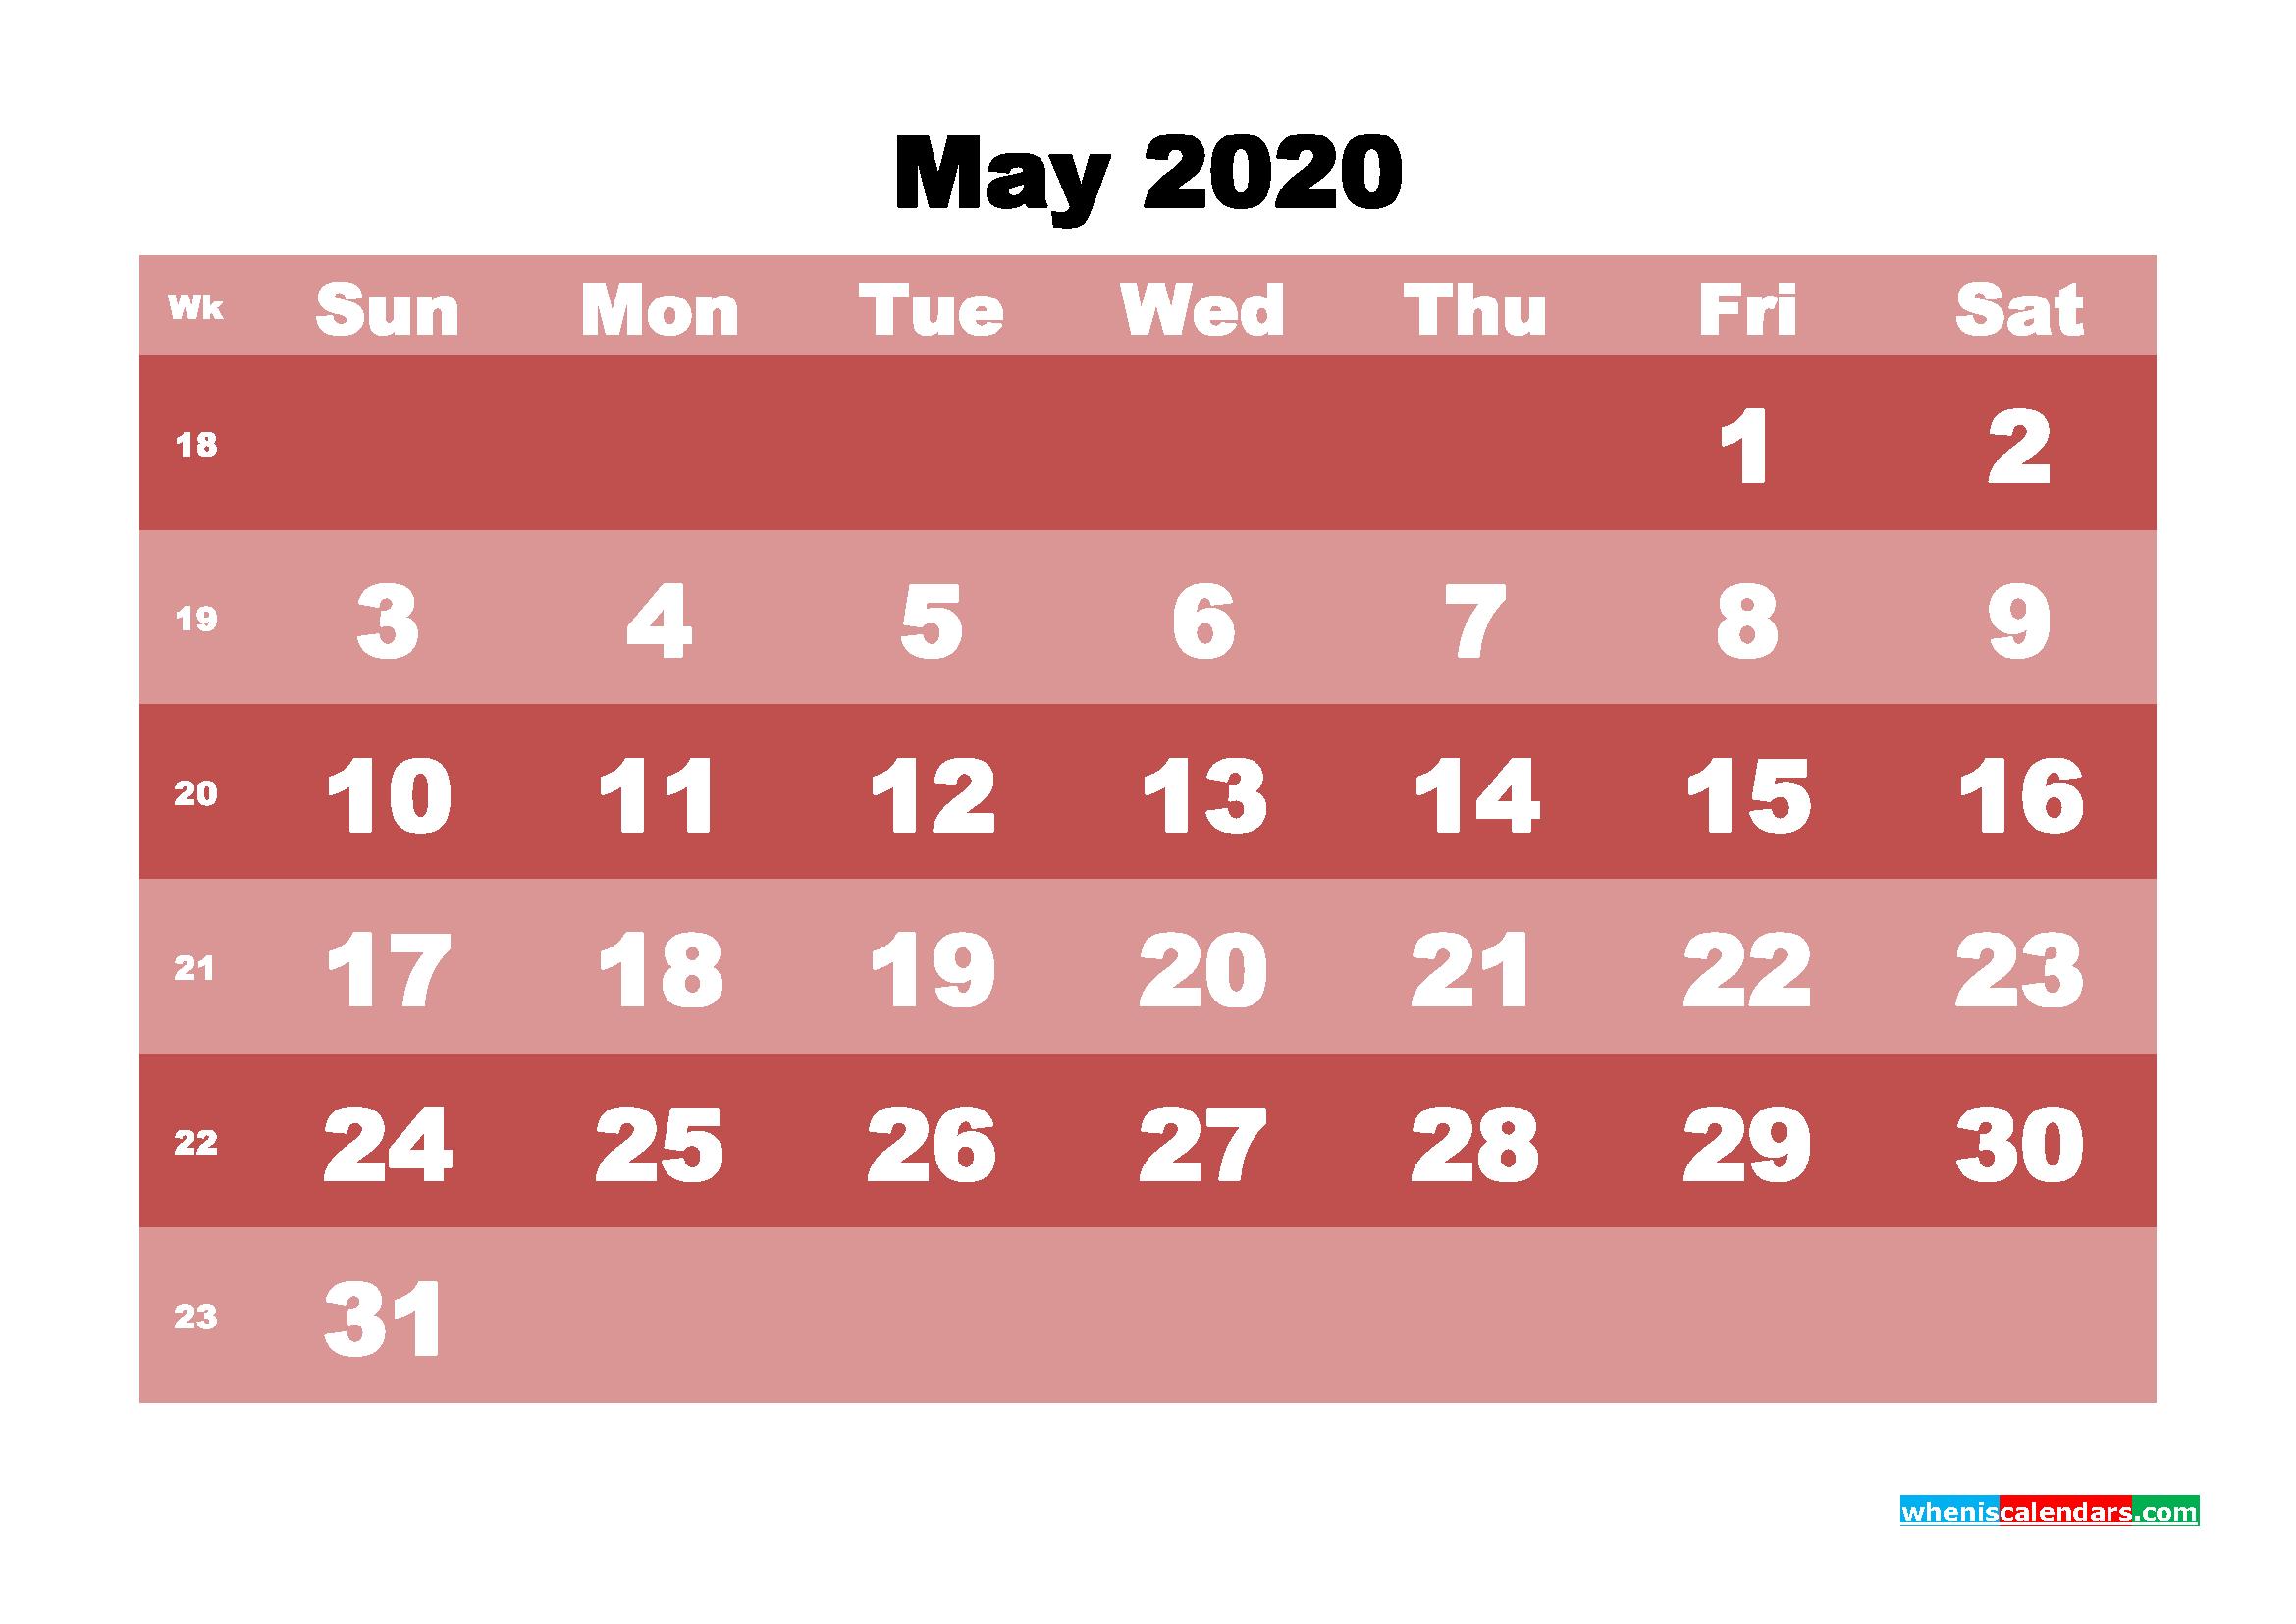 Free Printable May 2020 Calendar - No.m20b533